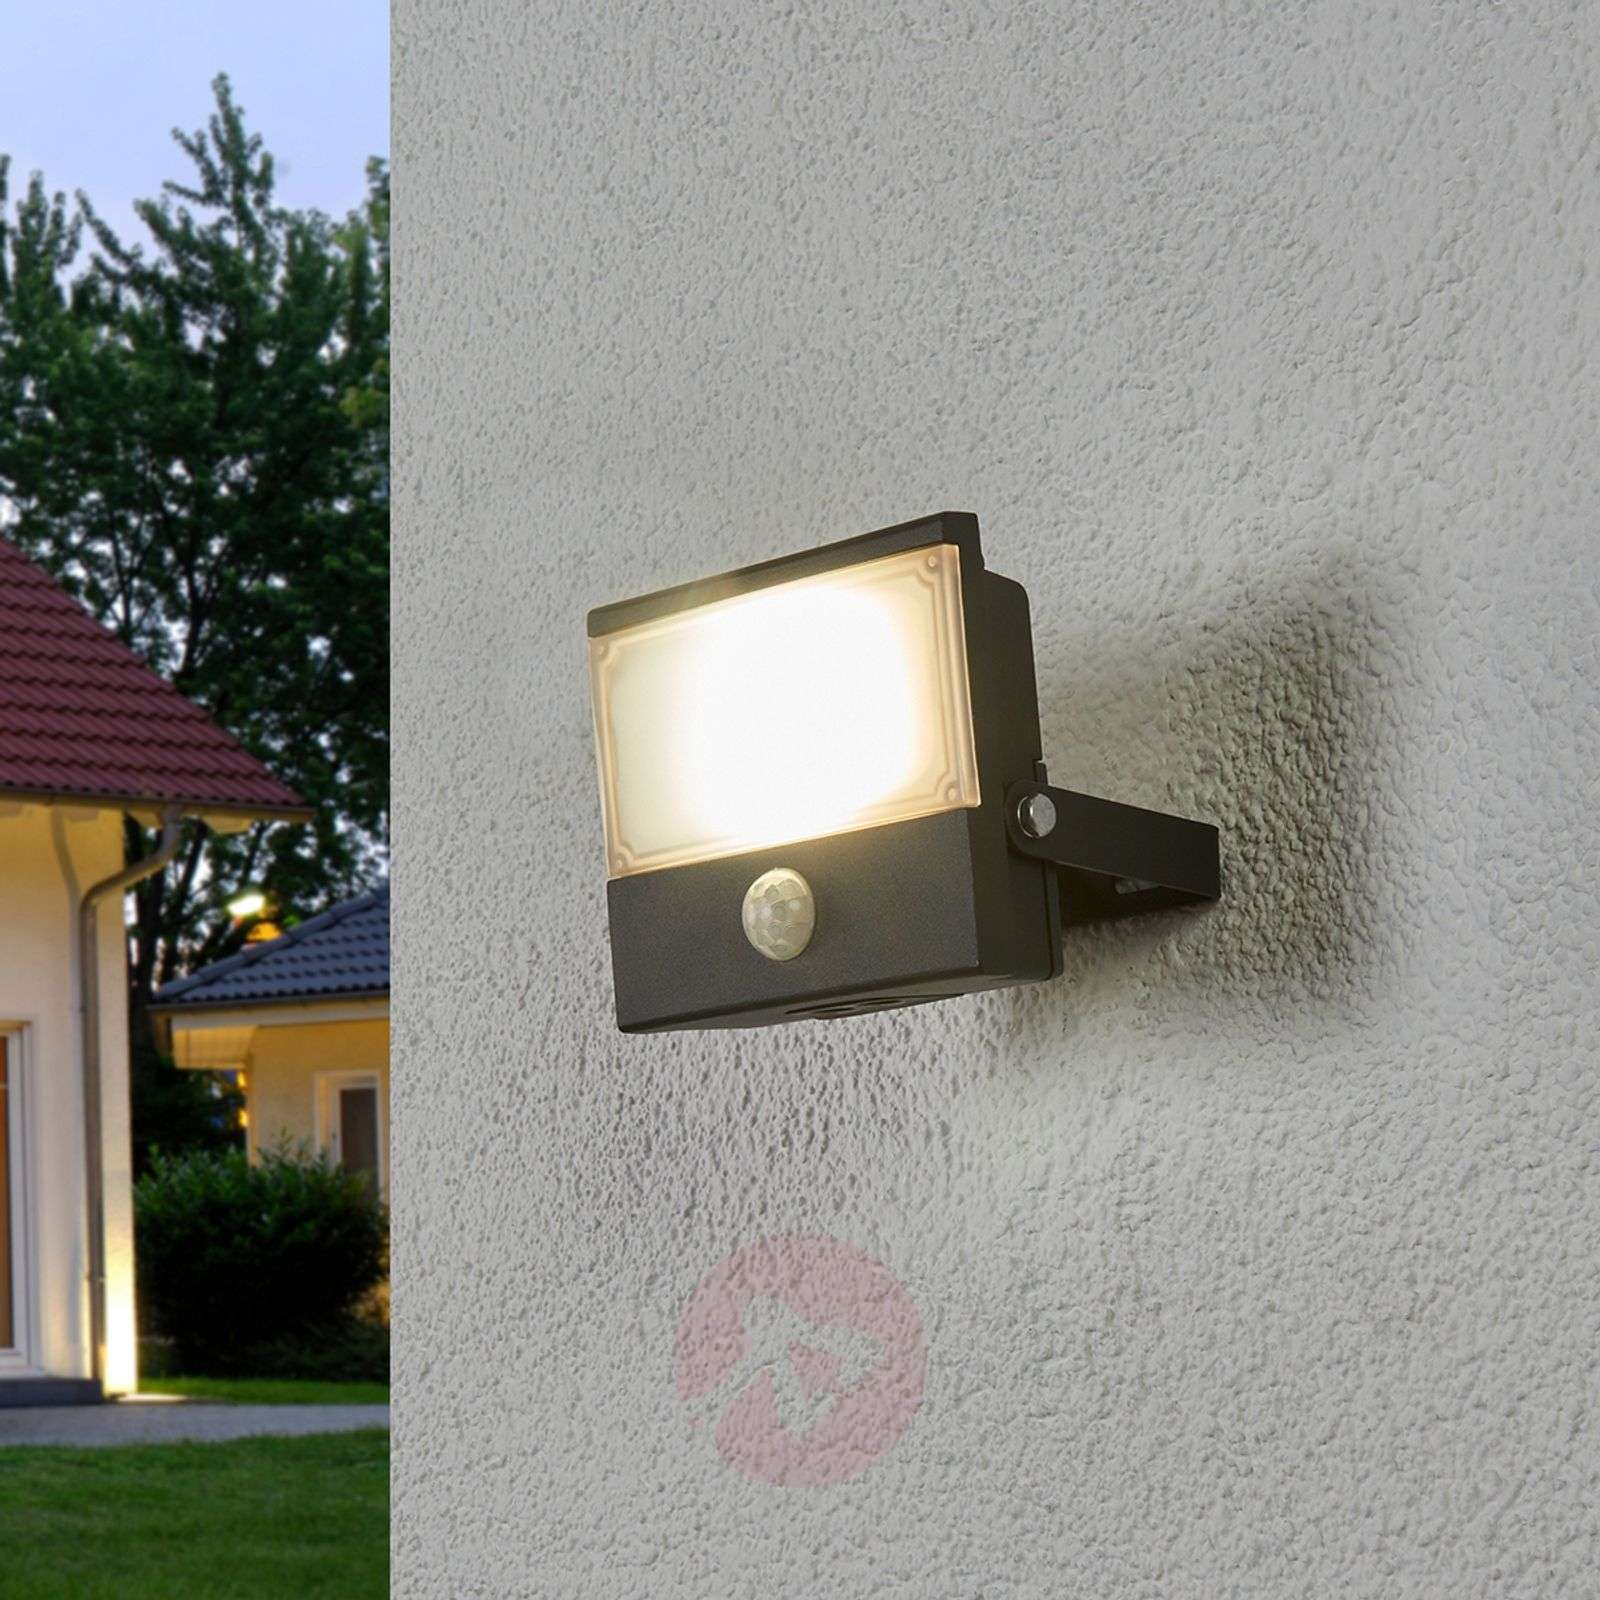 Auron LED-ulkovalaisin tunnistimella-4018059-03